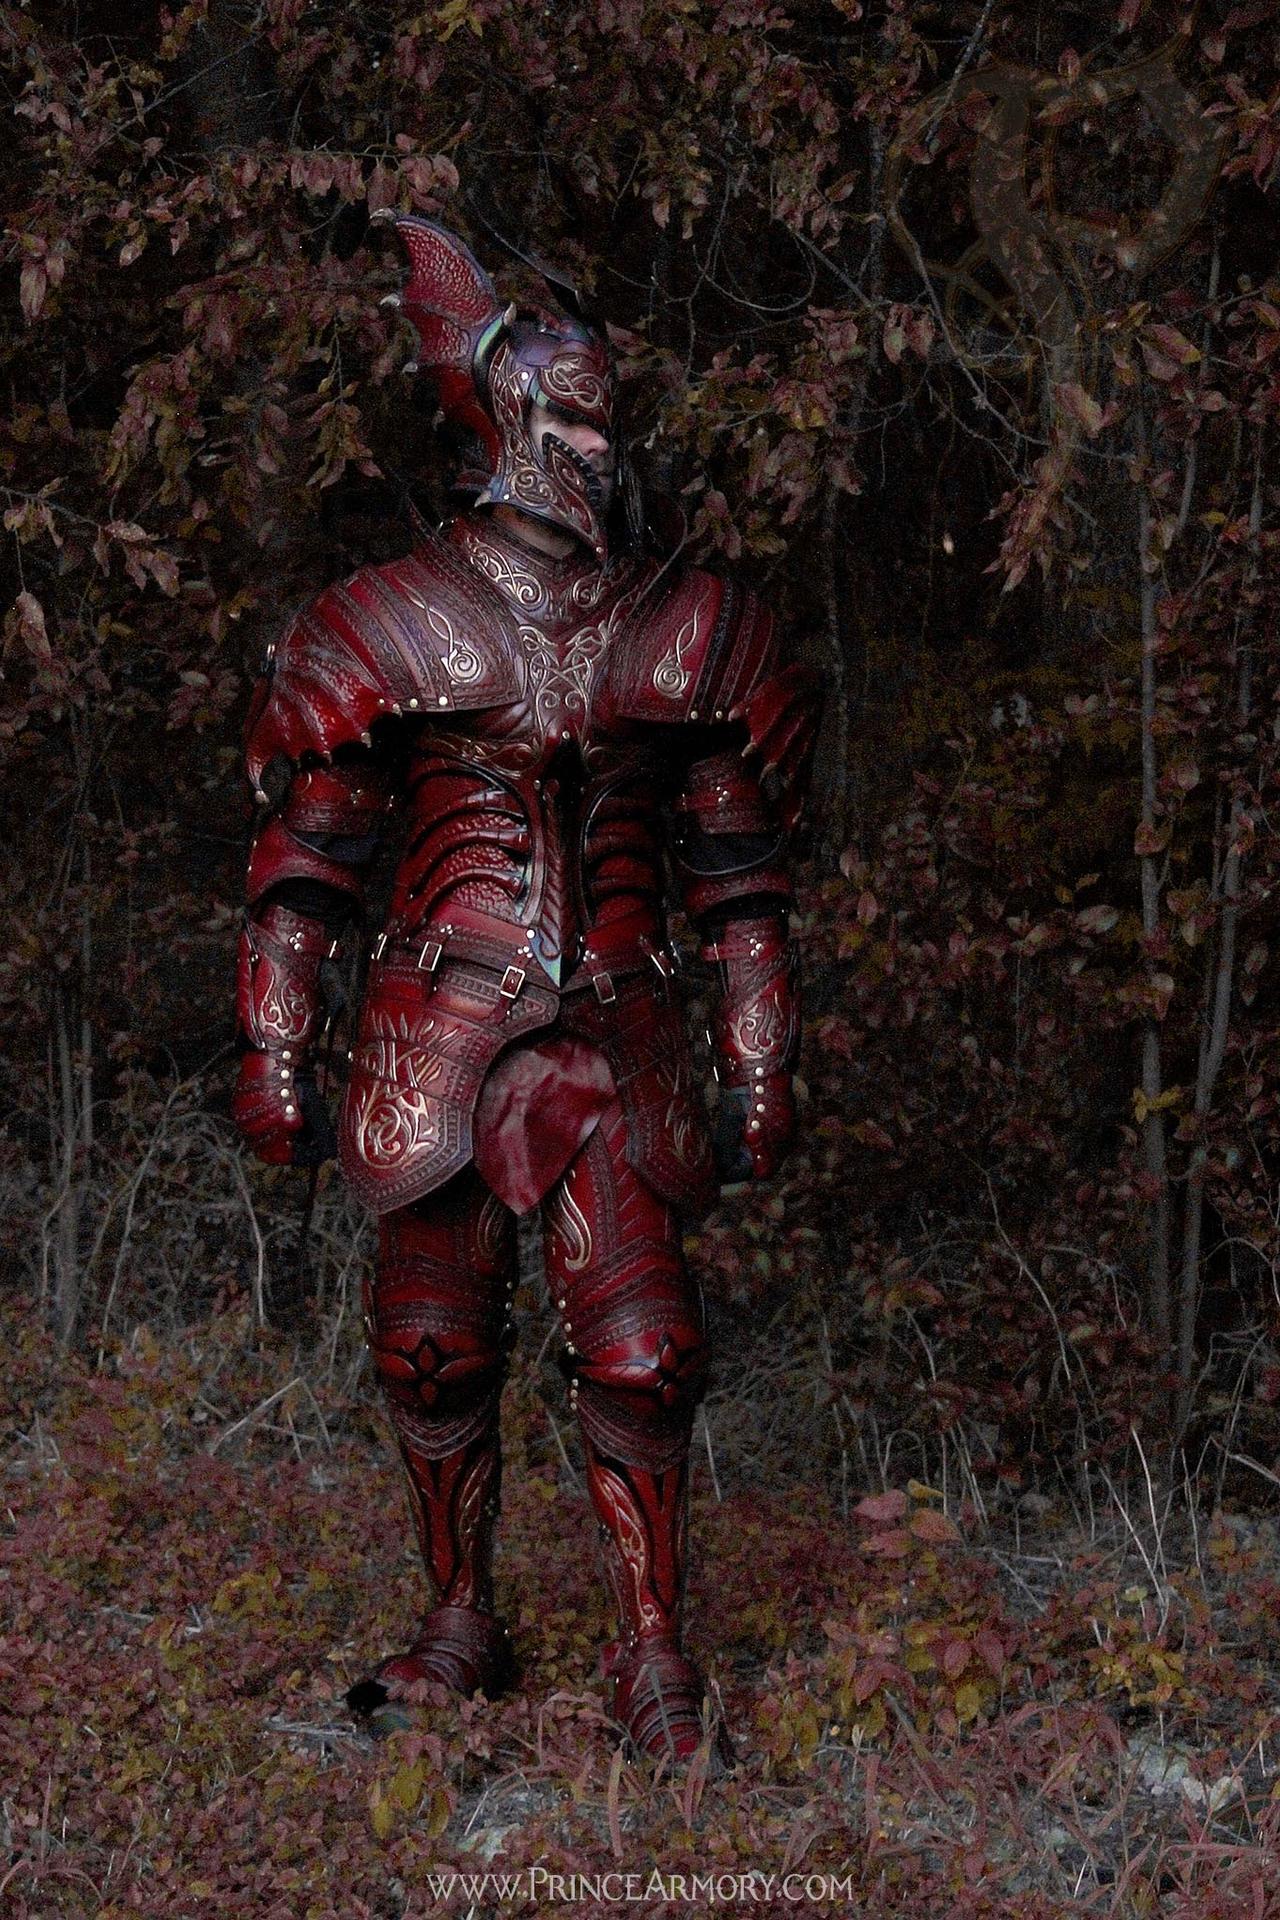 flame_dragon_armor_by_azmal-d6jqru0.jpg